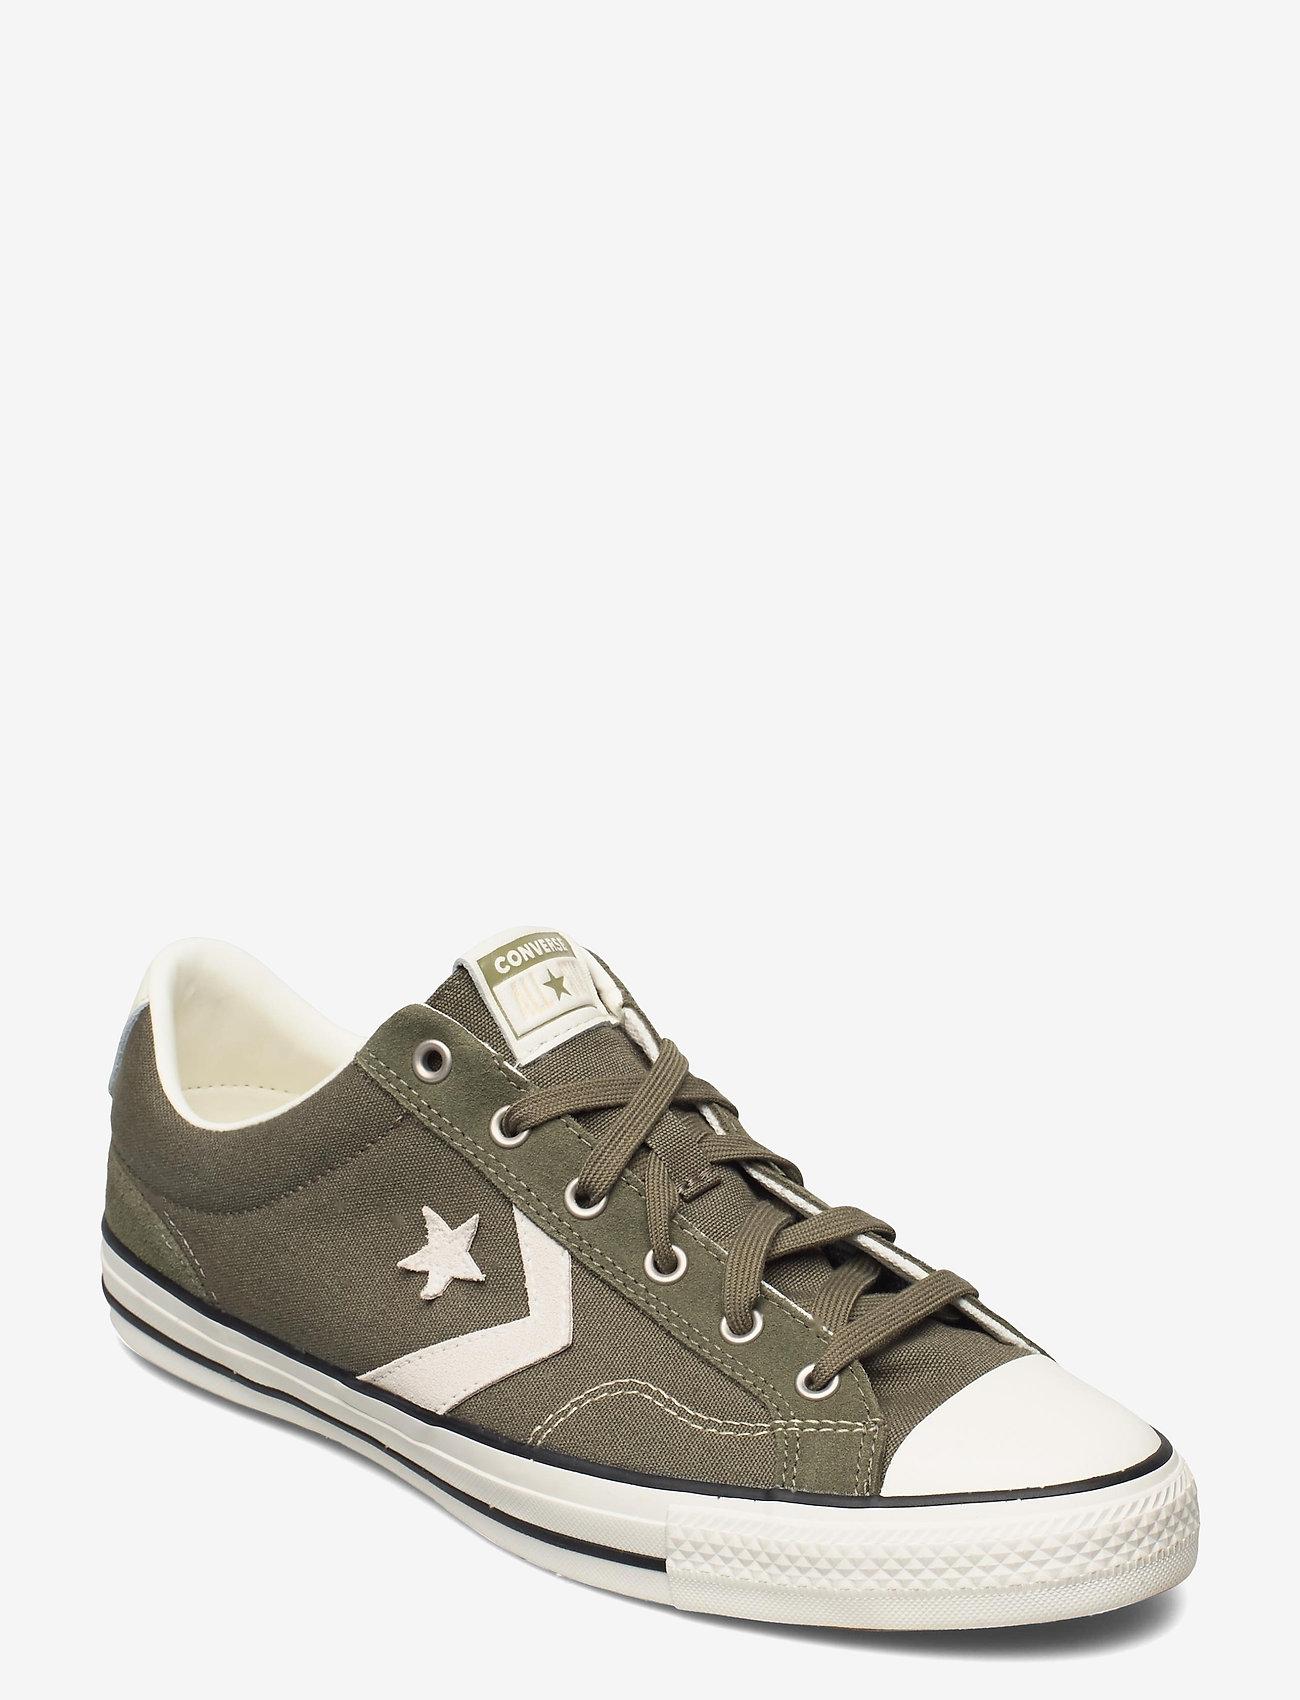 Converse Star Player Ox Field Surplus/egret/black - Sneakers ...